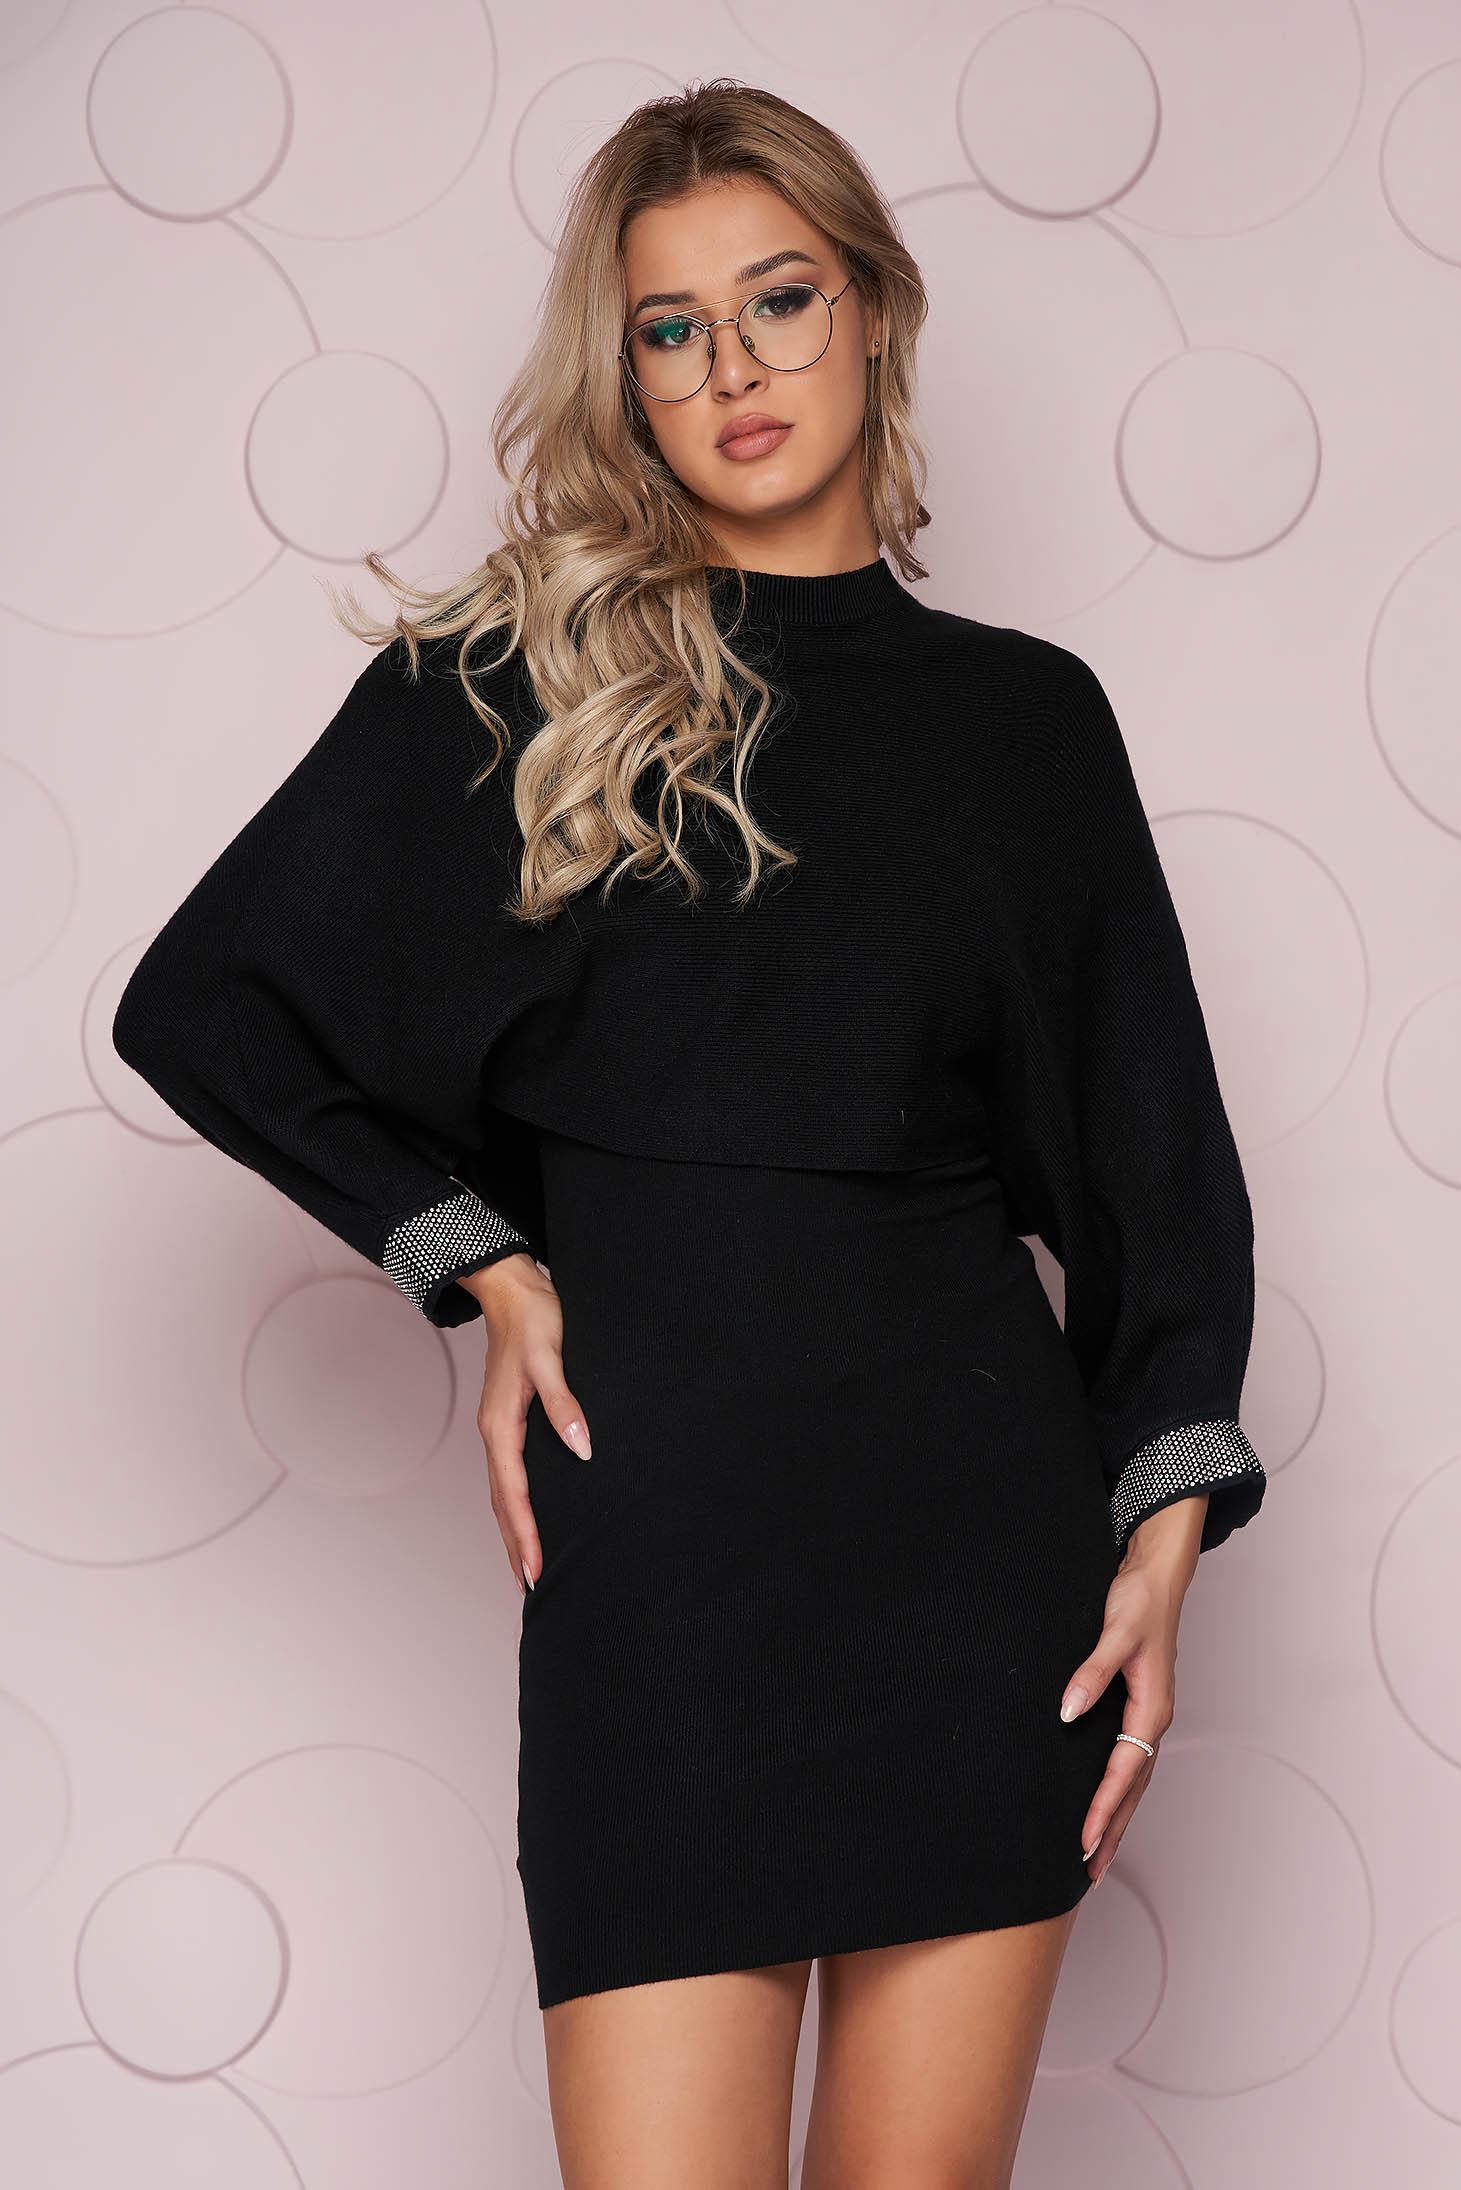 Rochie SunShine neagra eleganta cu maneca lunga tip